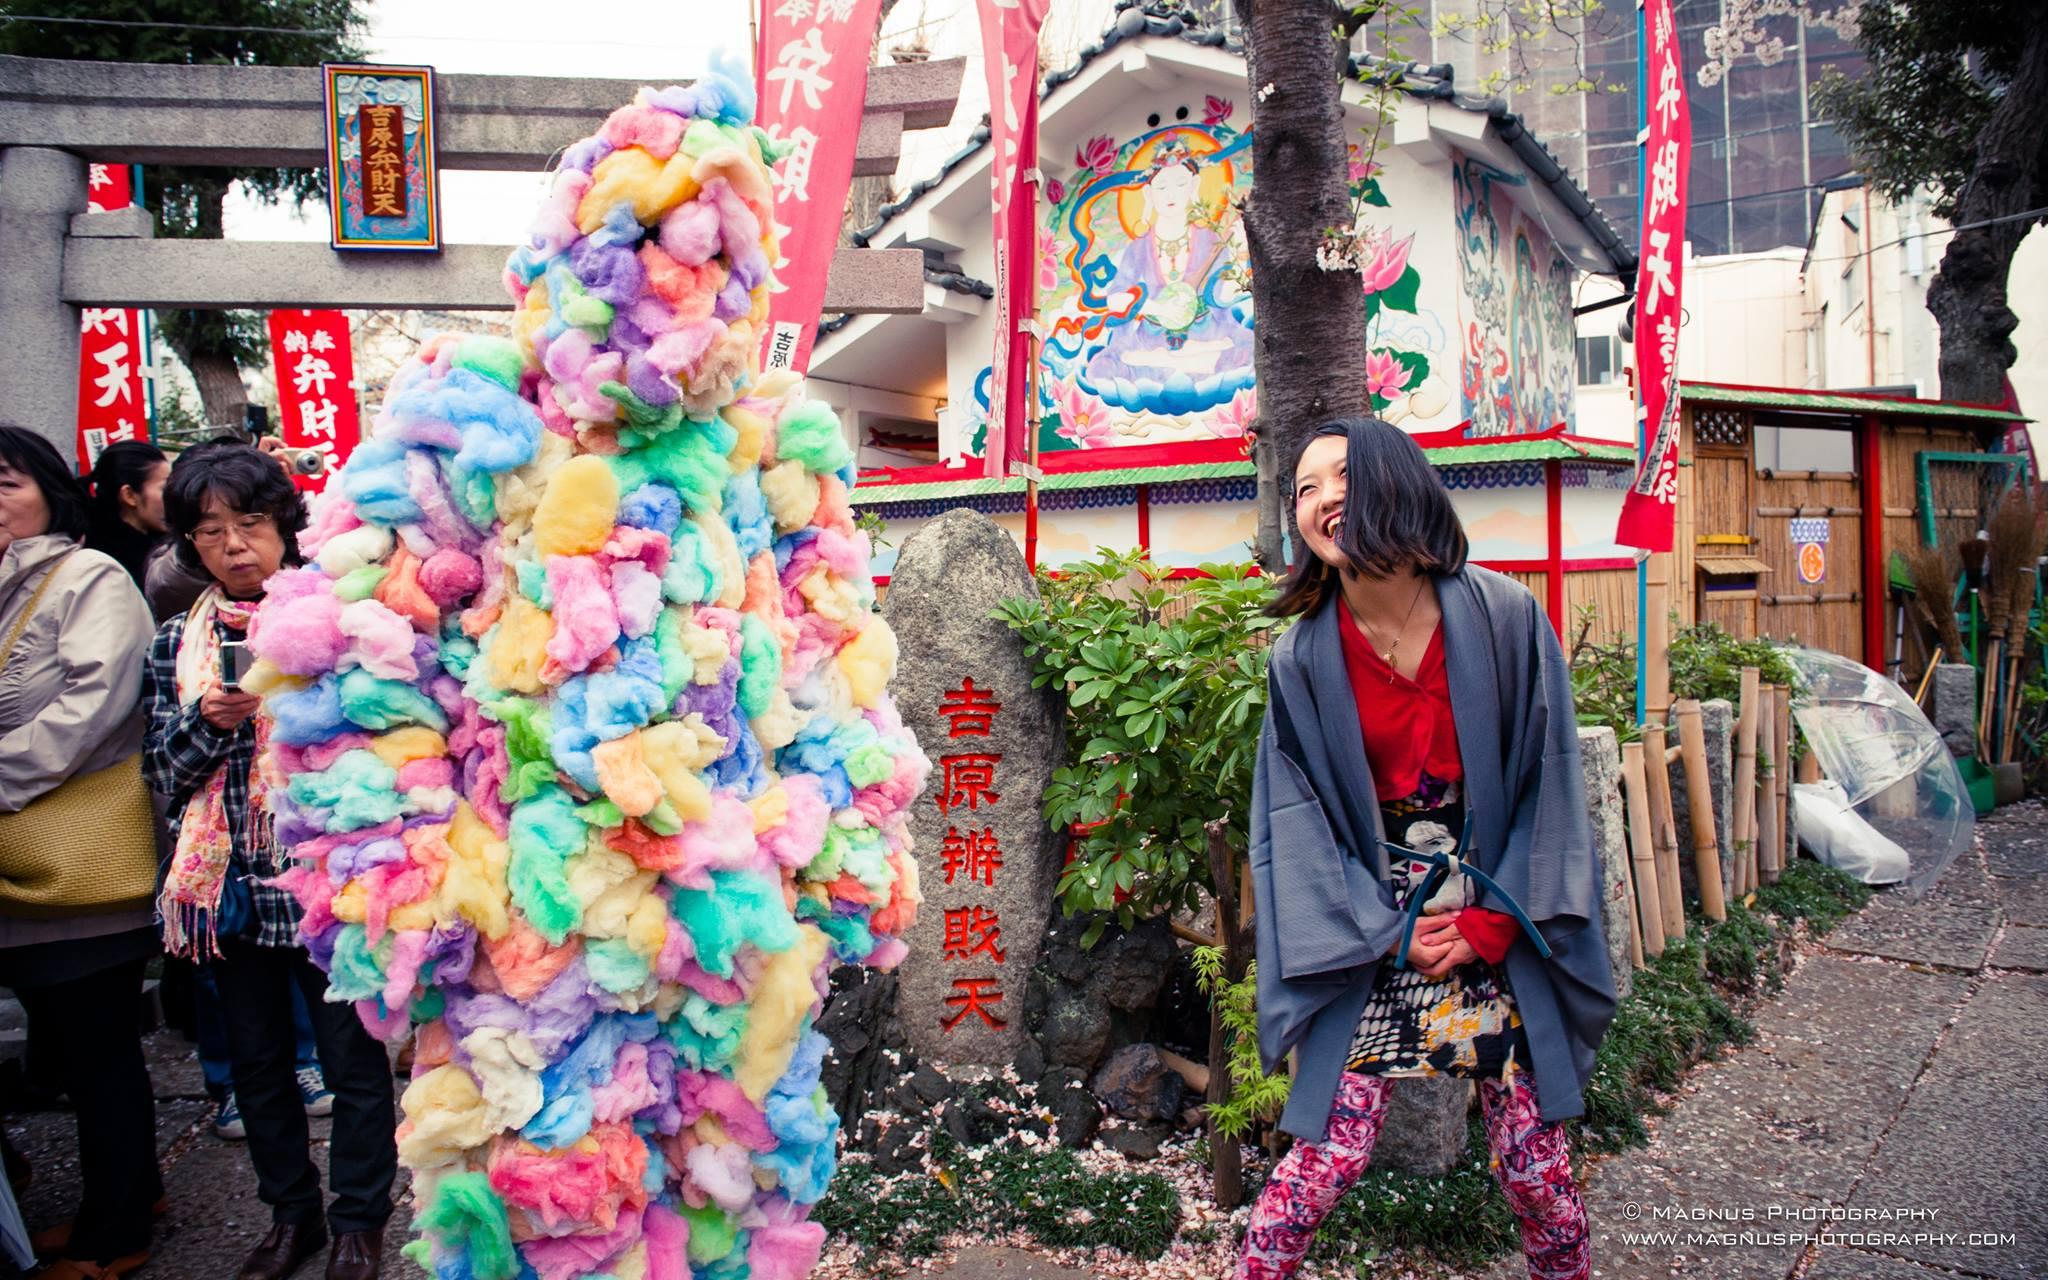 2014/8/31 Deco : Ichiko Funai